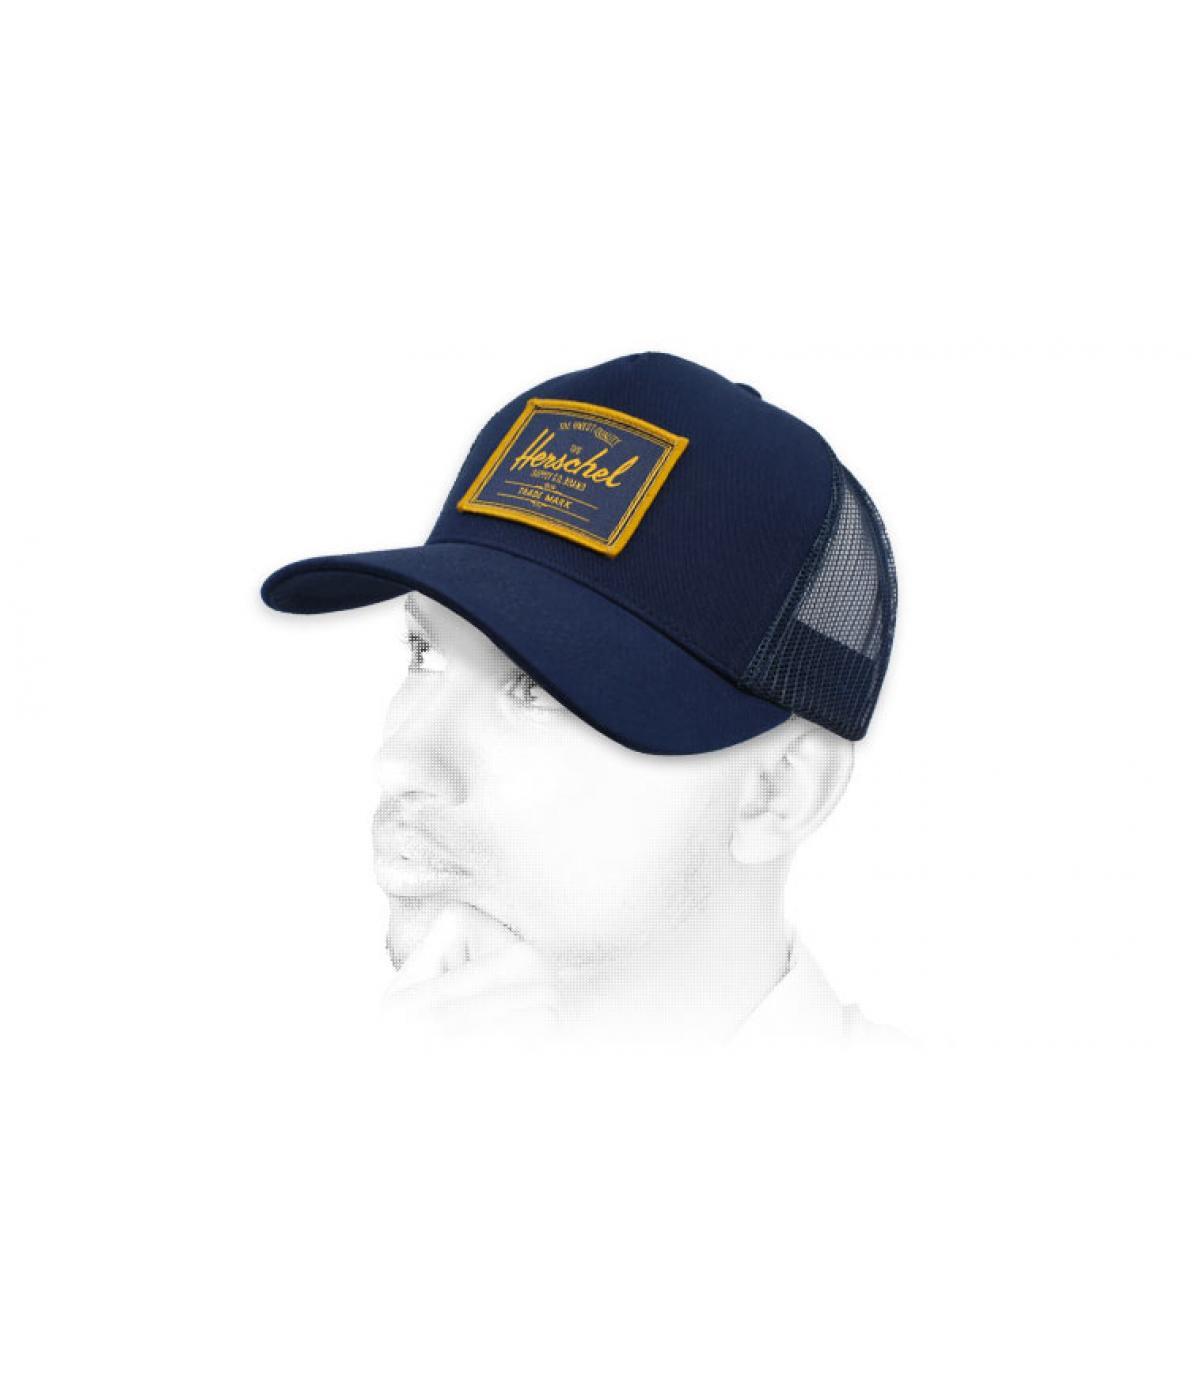 blue Herschel trucker patch